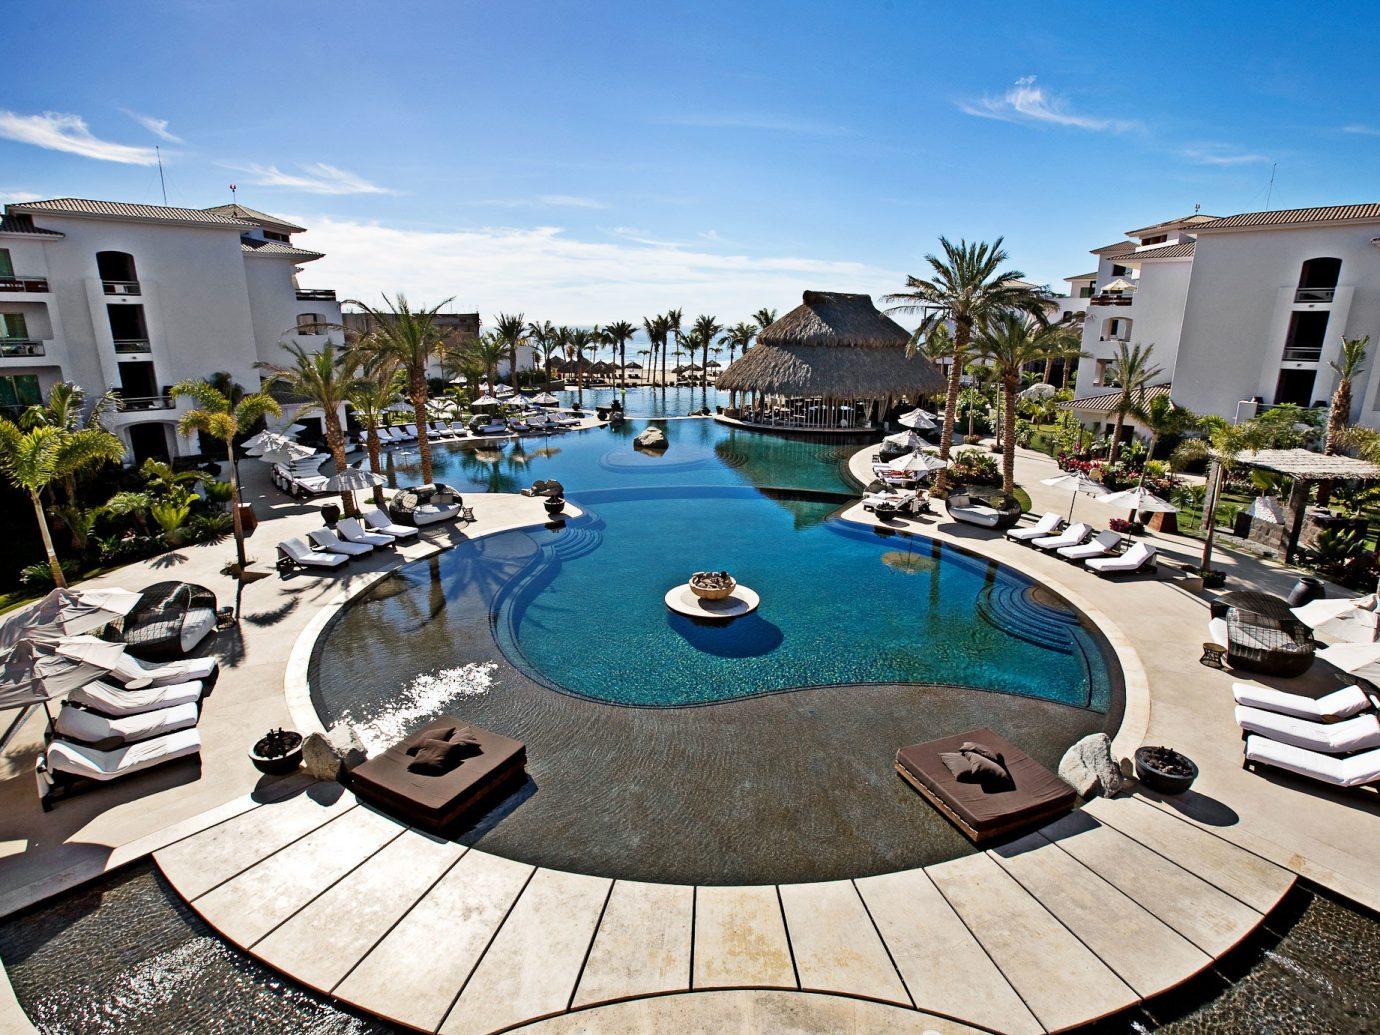 Budget Hotels sky outdoor ground swimming pool property leisure estate backyard Resort mansion Villa condominium sandy day